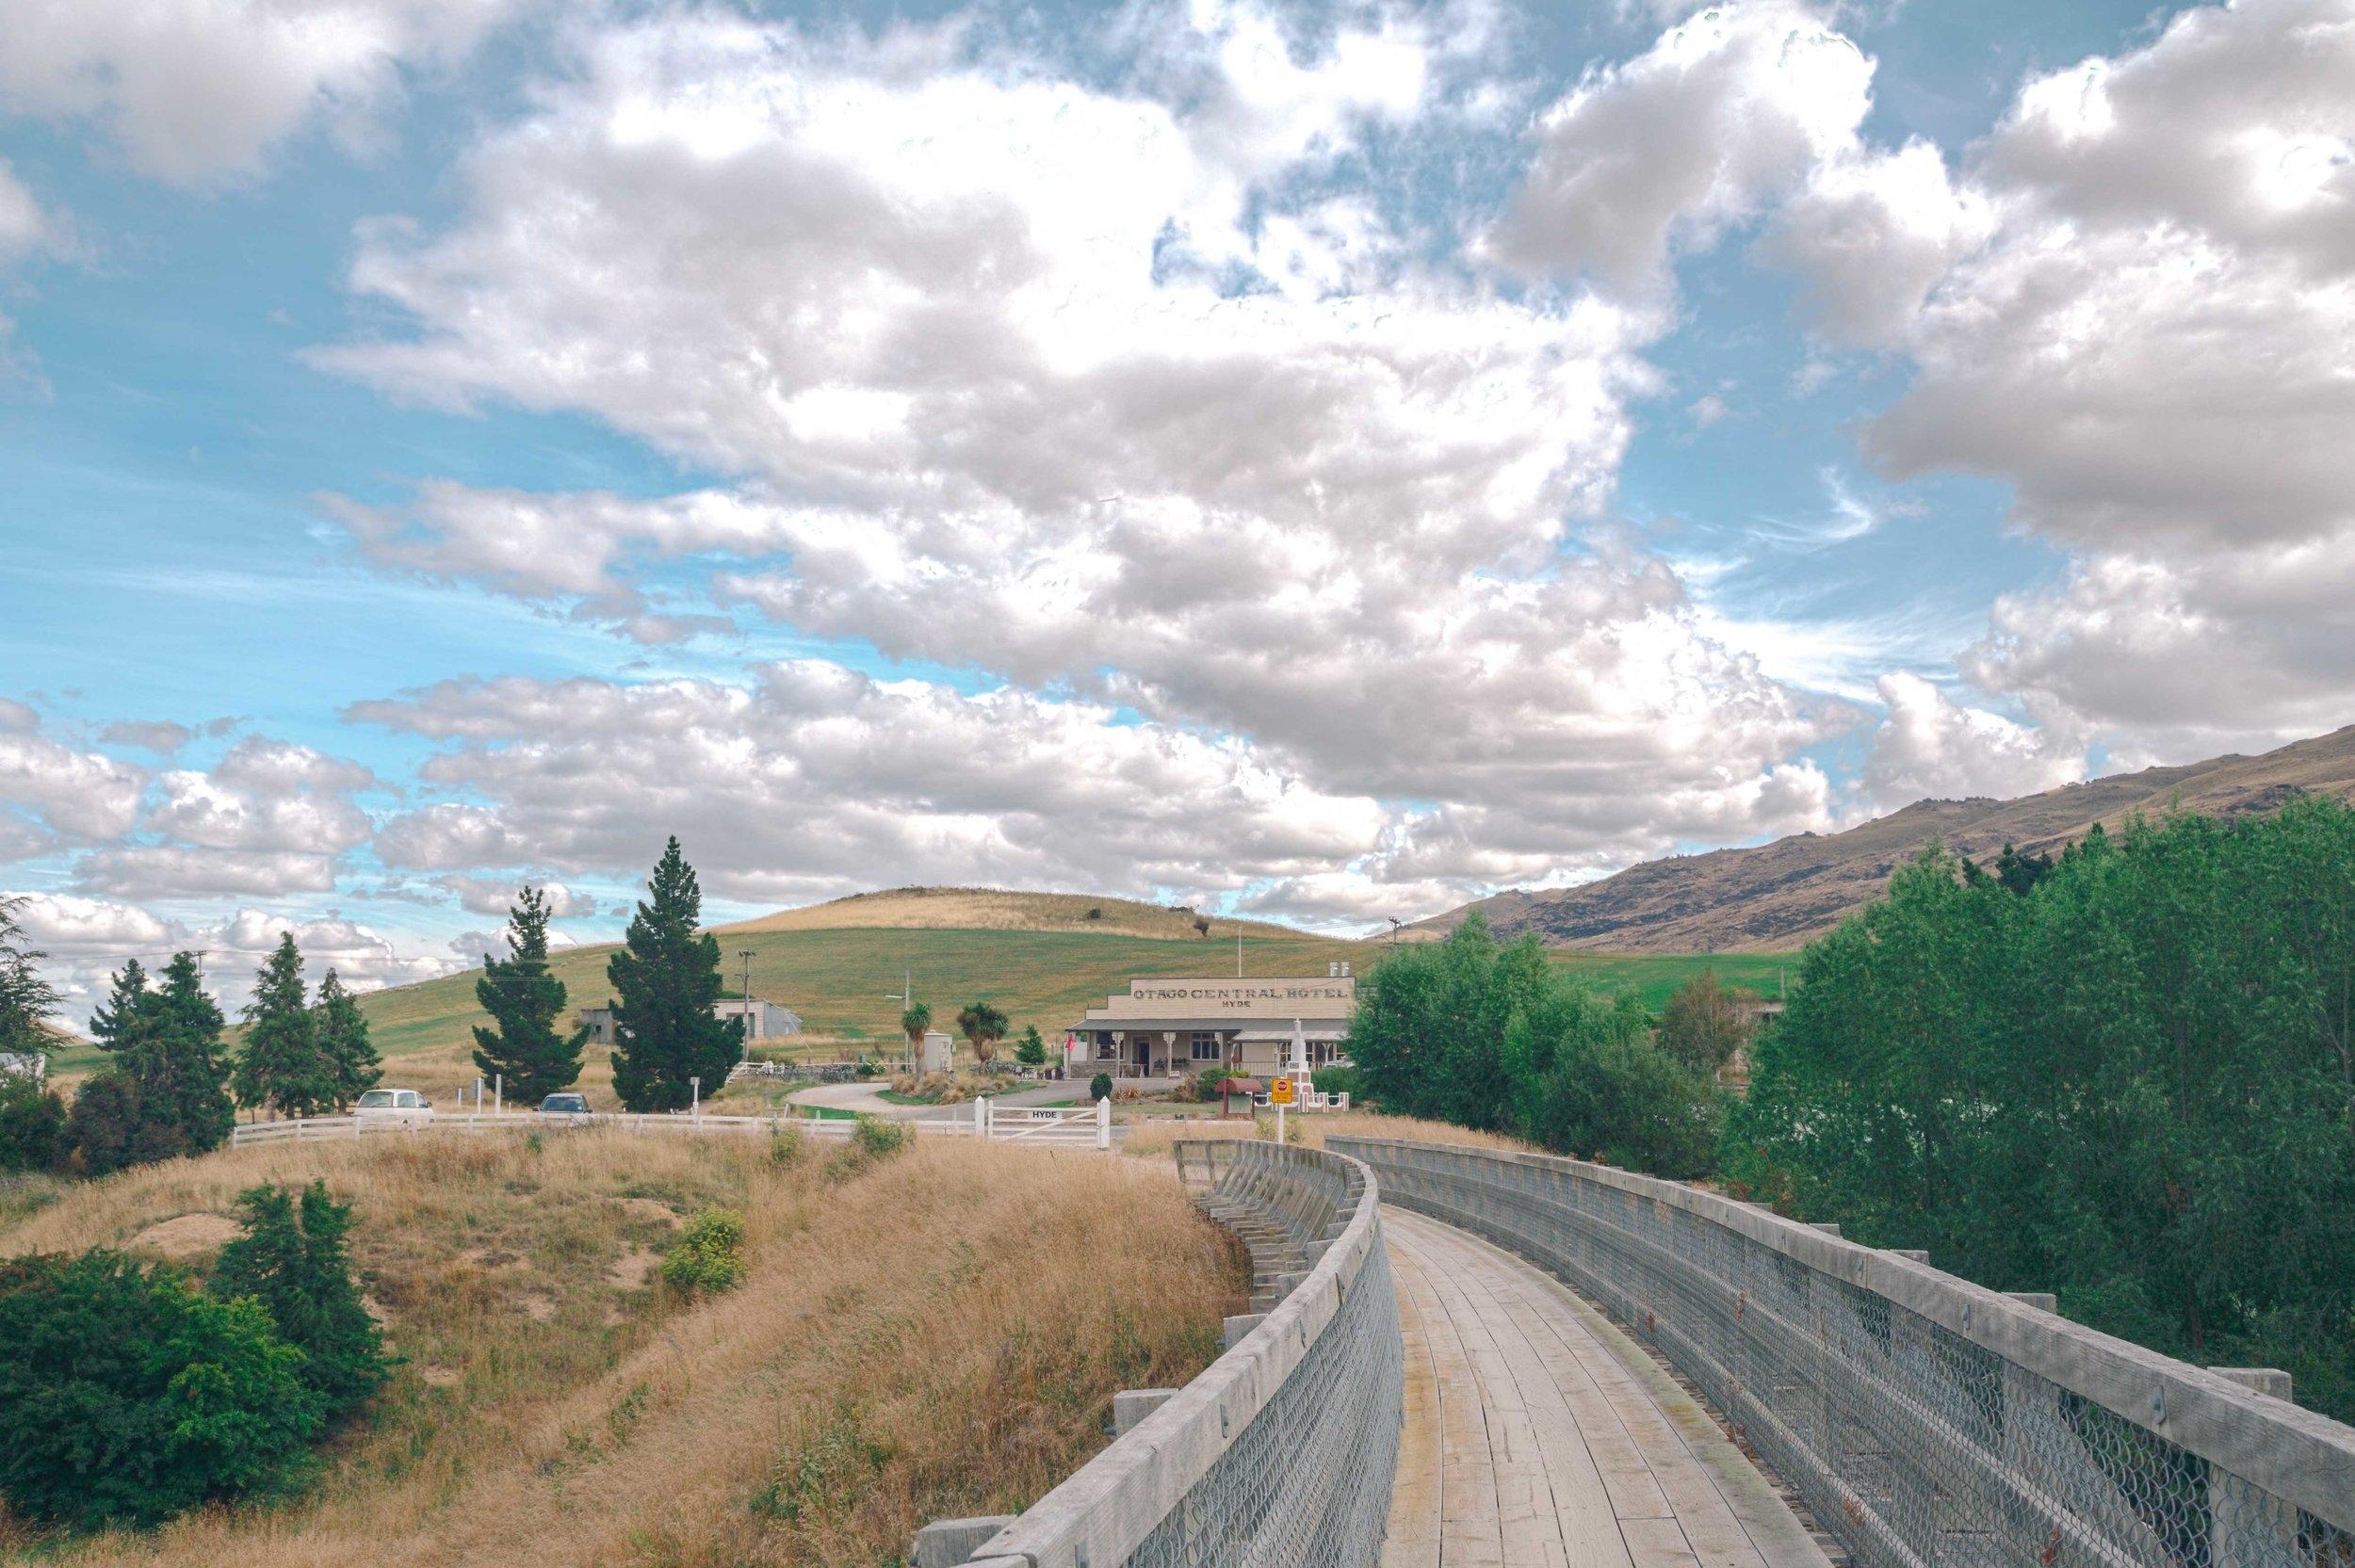 5513-Otago-Central-Rail-Trail-Miles-Holden.jpg